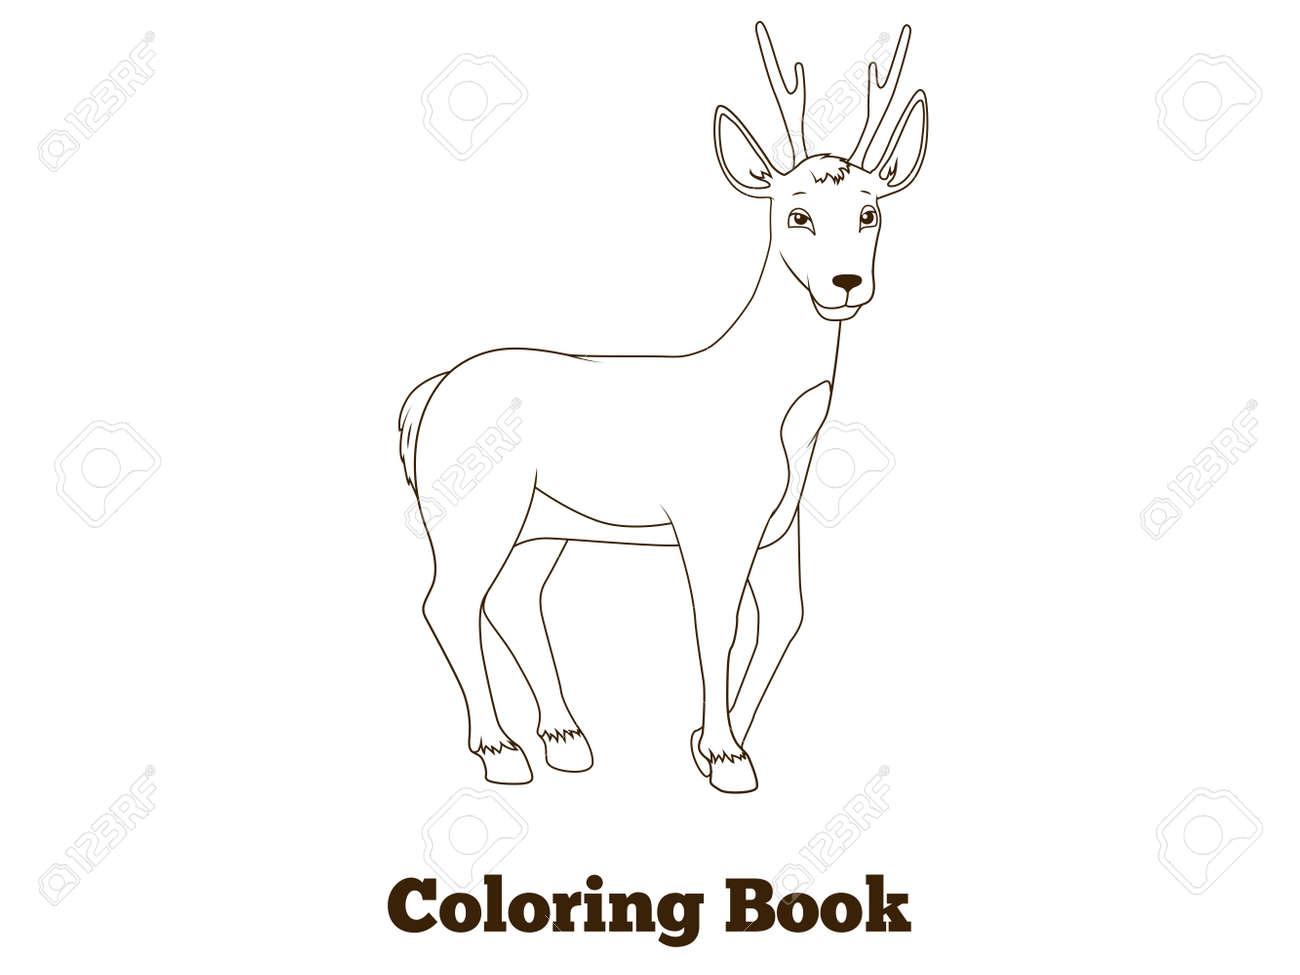 Coloring Book Forest Animal Roe Deer Cartoon For Children Vector Illustration Stock